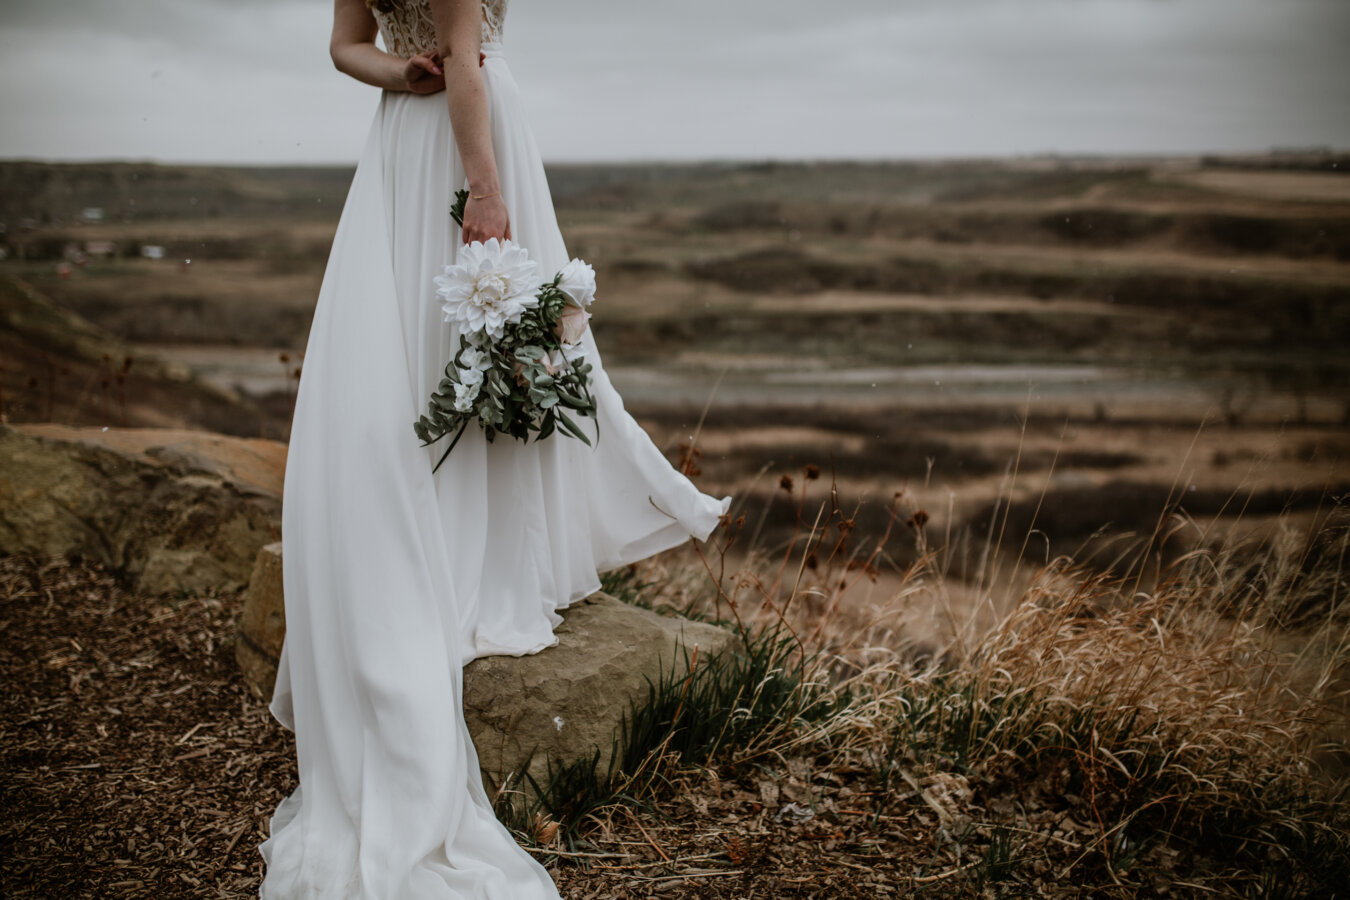 Saskatoon Farm Wedding | Best Calgary Wedding Photographers | Farm Weddings | Calgary Photography | Alberta Wedding Photos